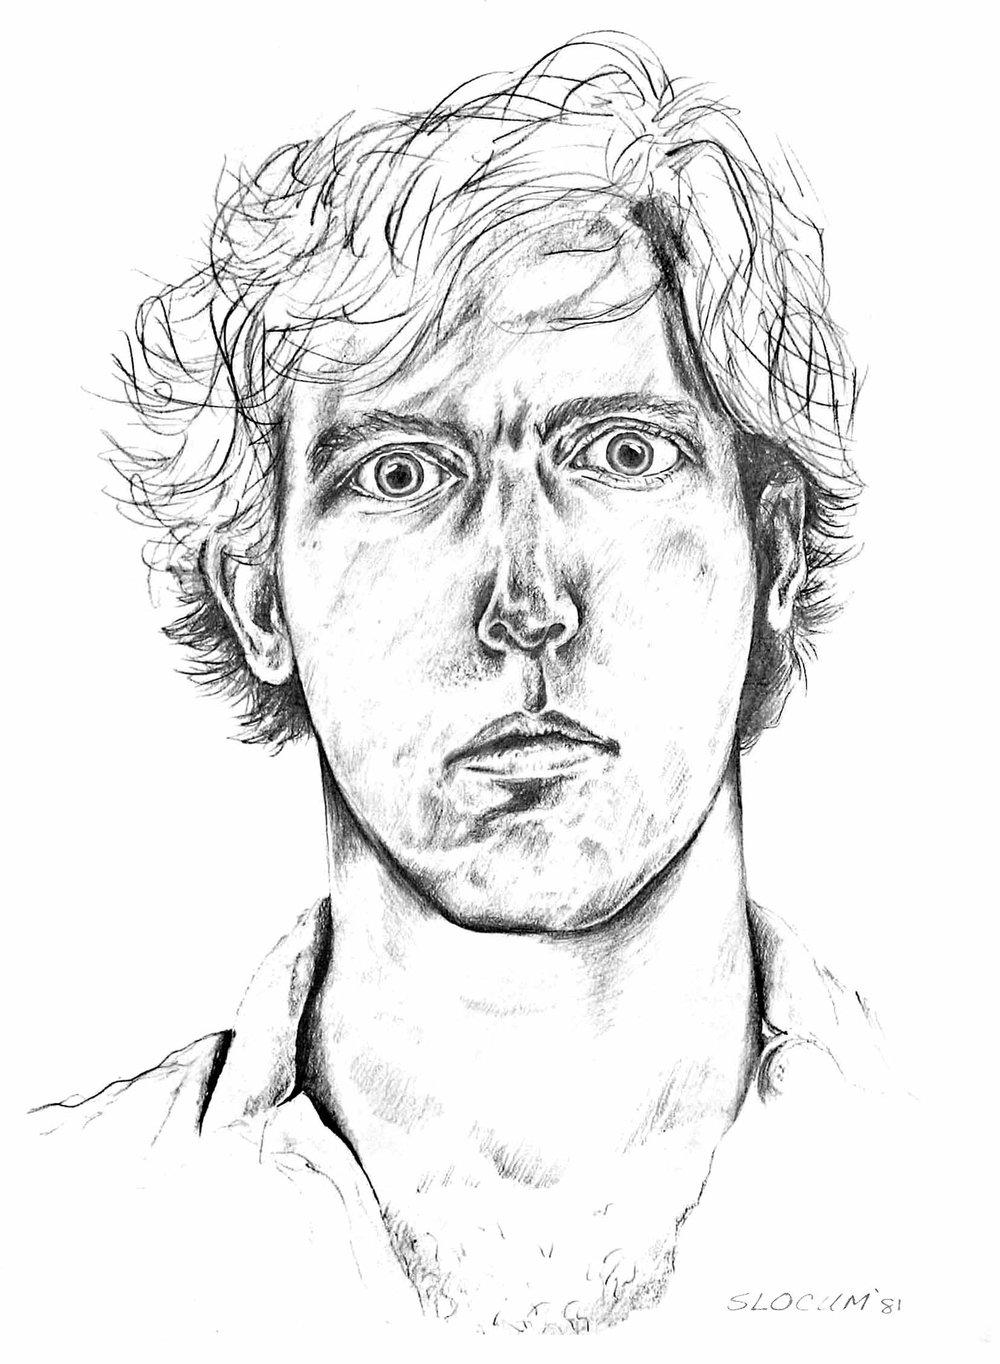 1000x1364 Pencil Drawings (1980 1990) Jon Slocums Art